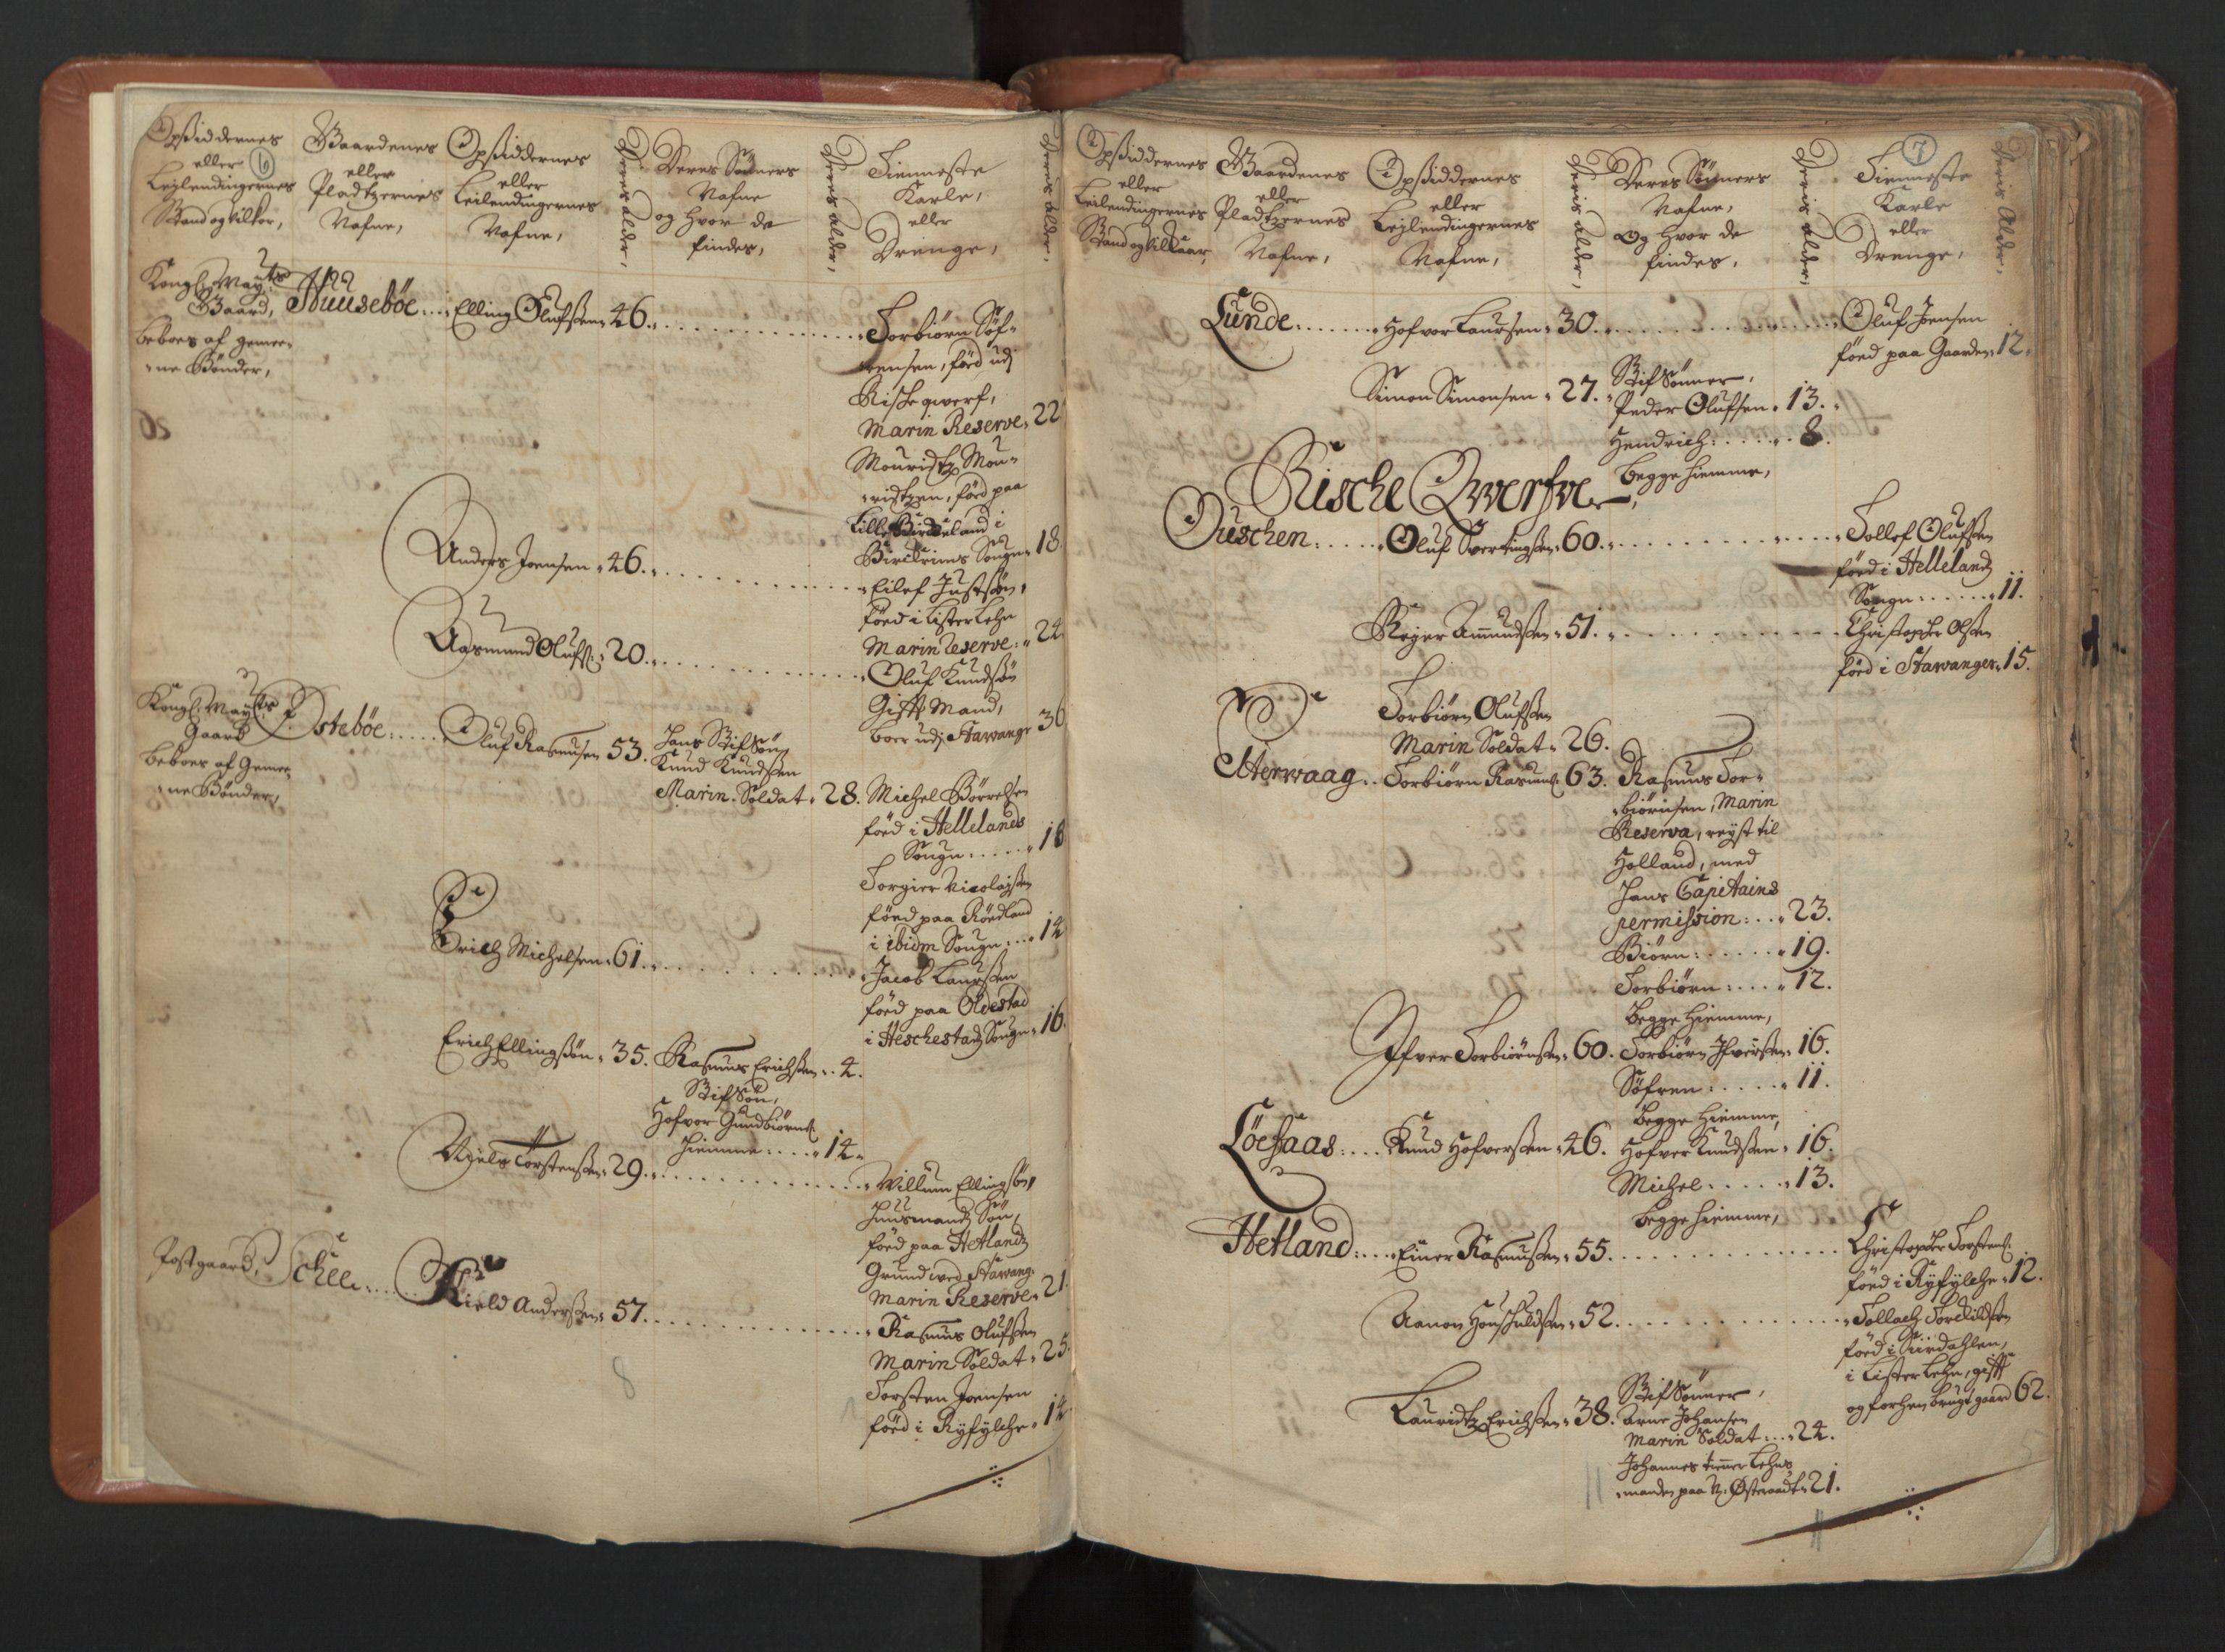 RA, Manntallet 1701, nr. 4: Jæren og Dalane fogderi, 1701, s. 6-7